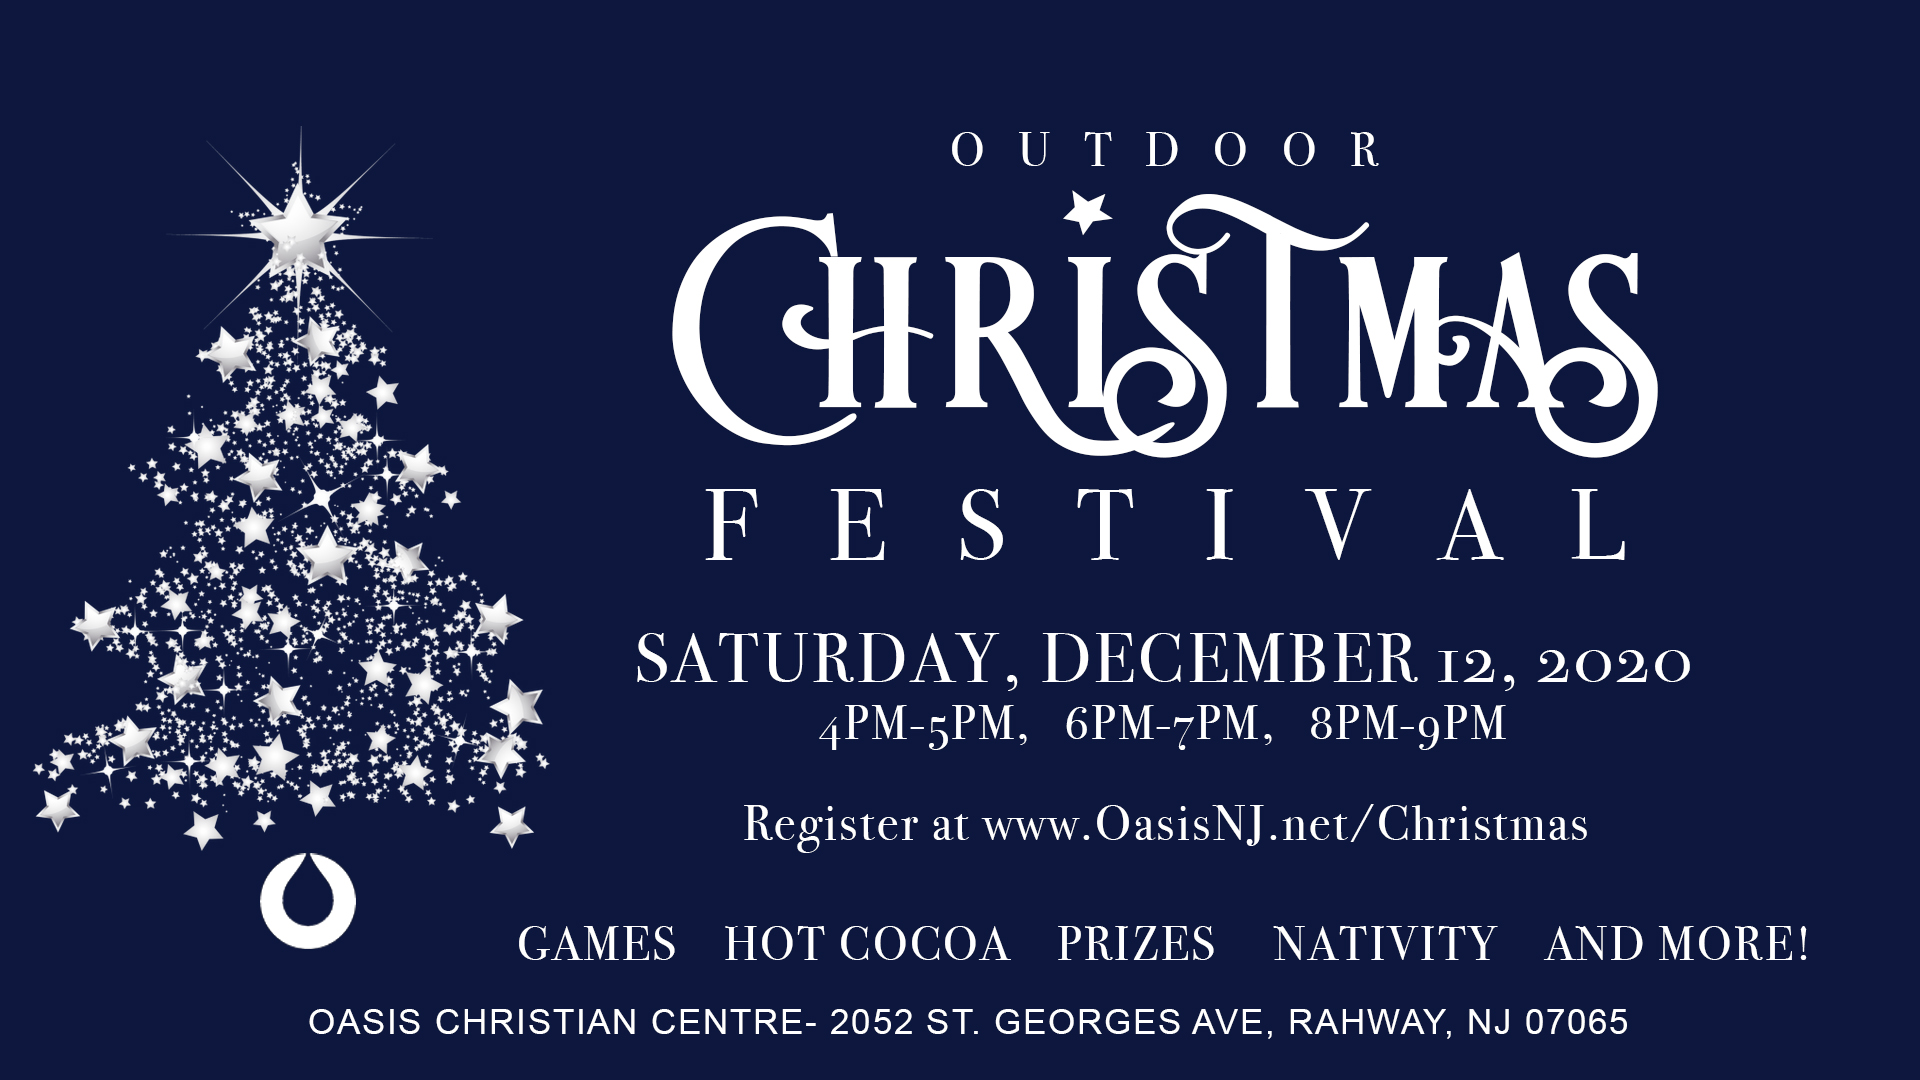 NEW CHRISTMAS FESTIVAL